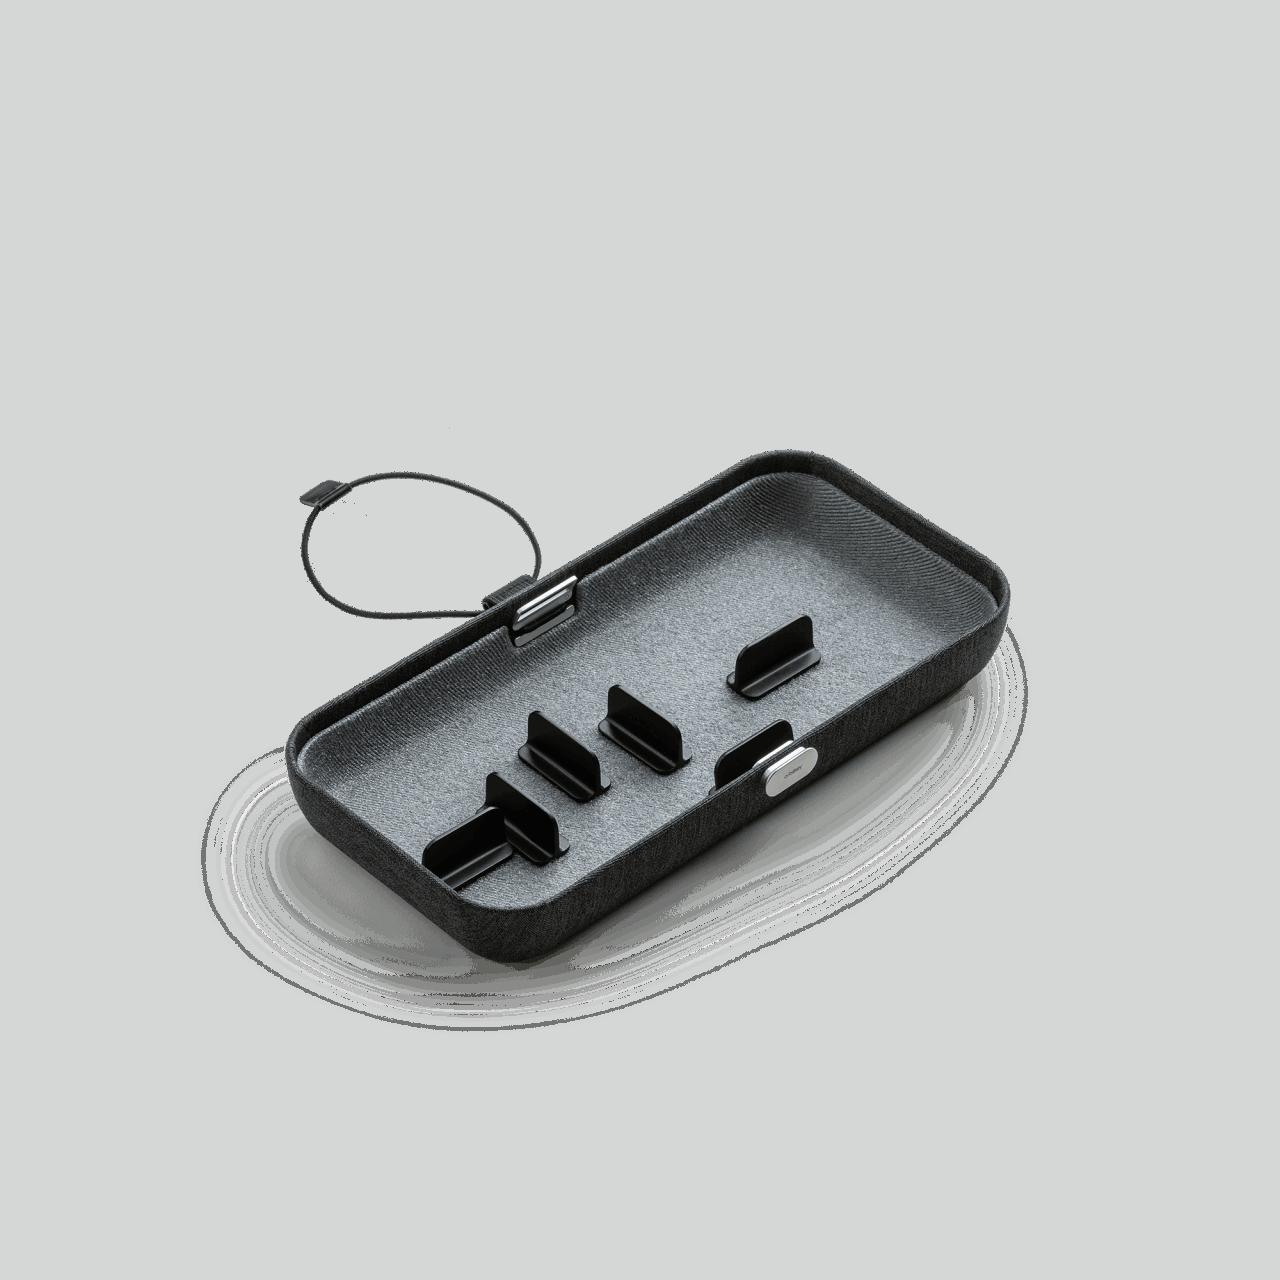 Orbitkey Nest - Black